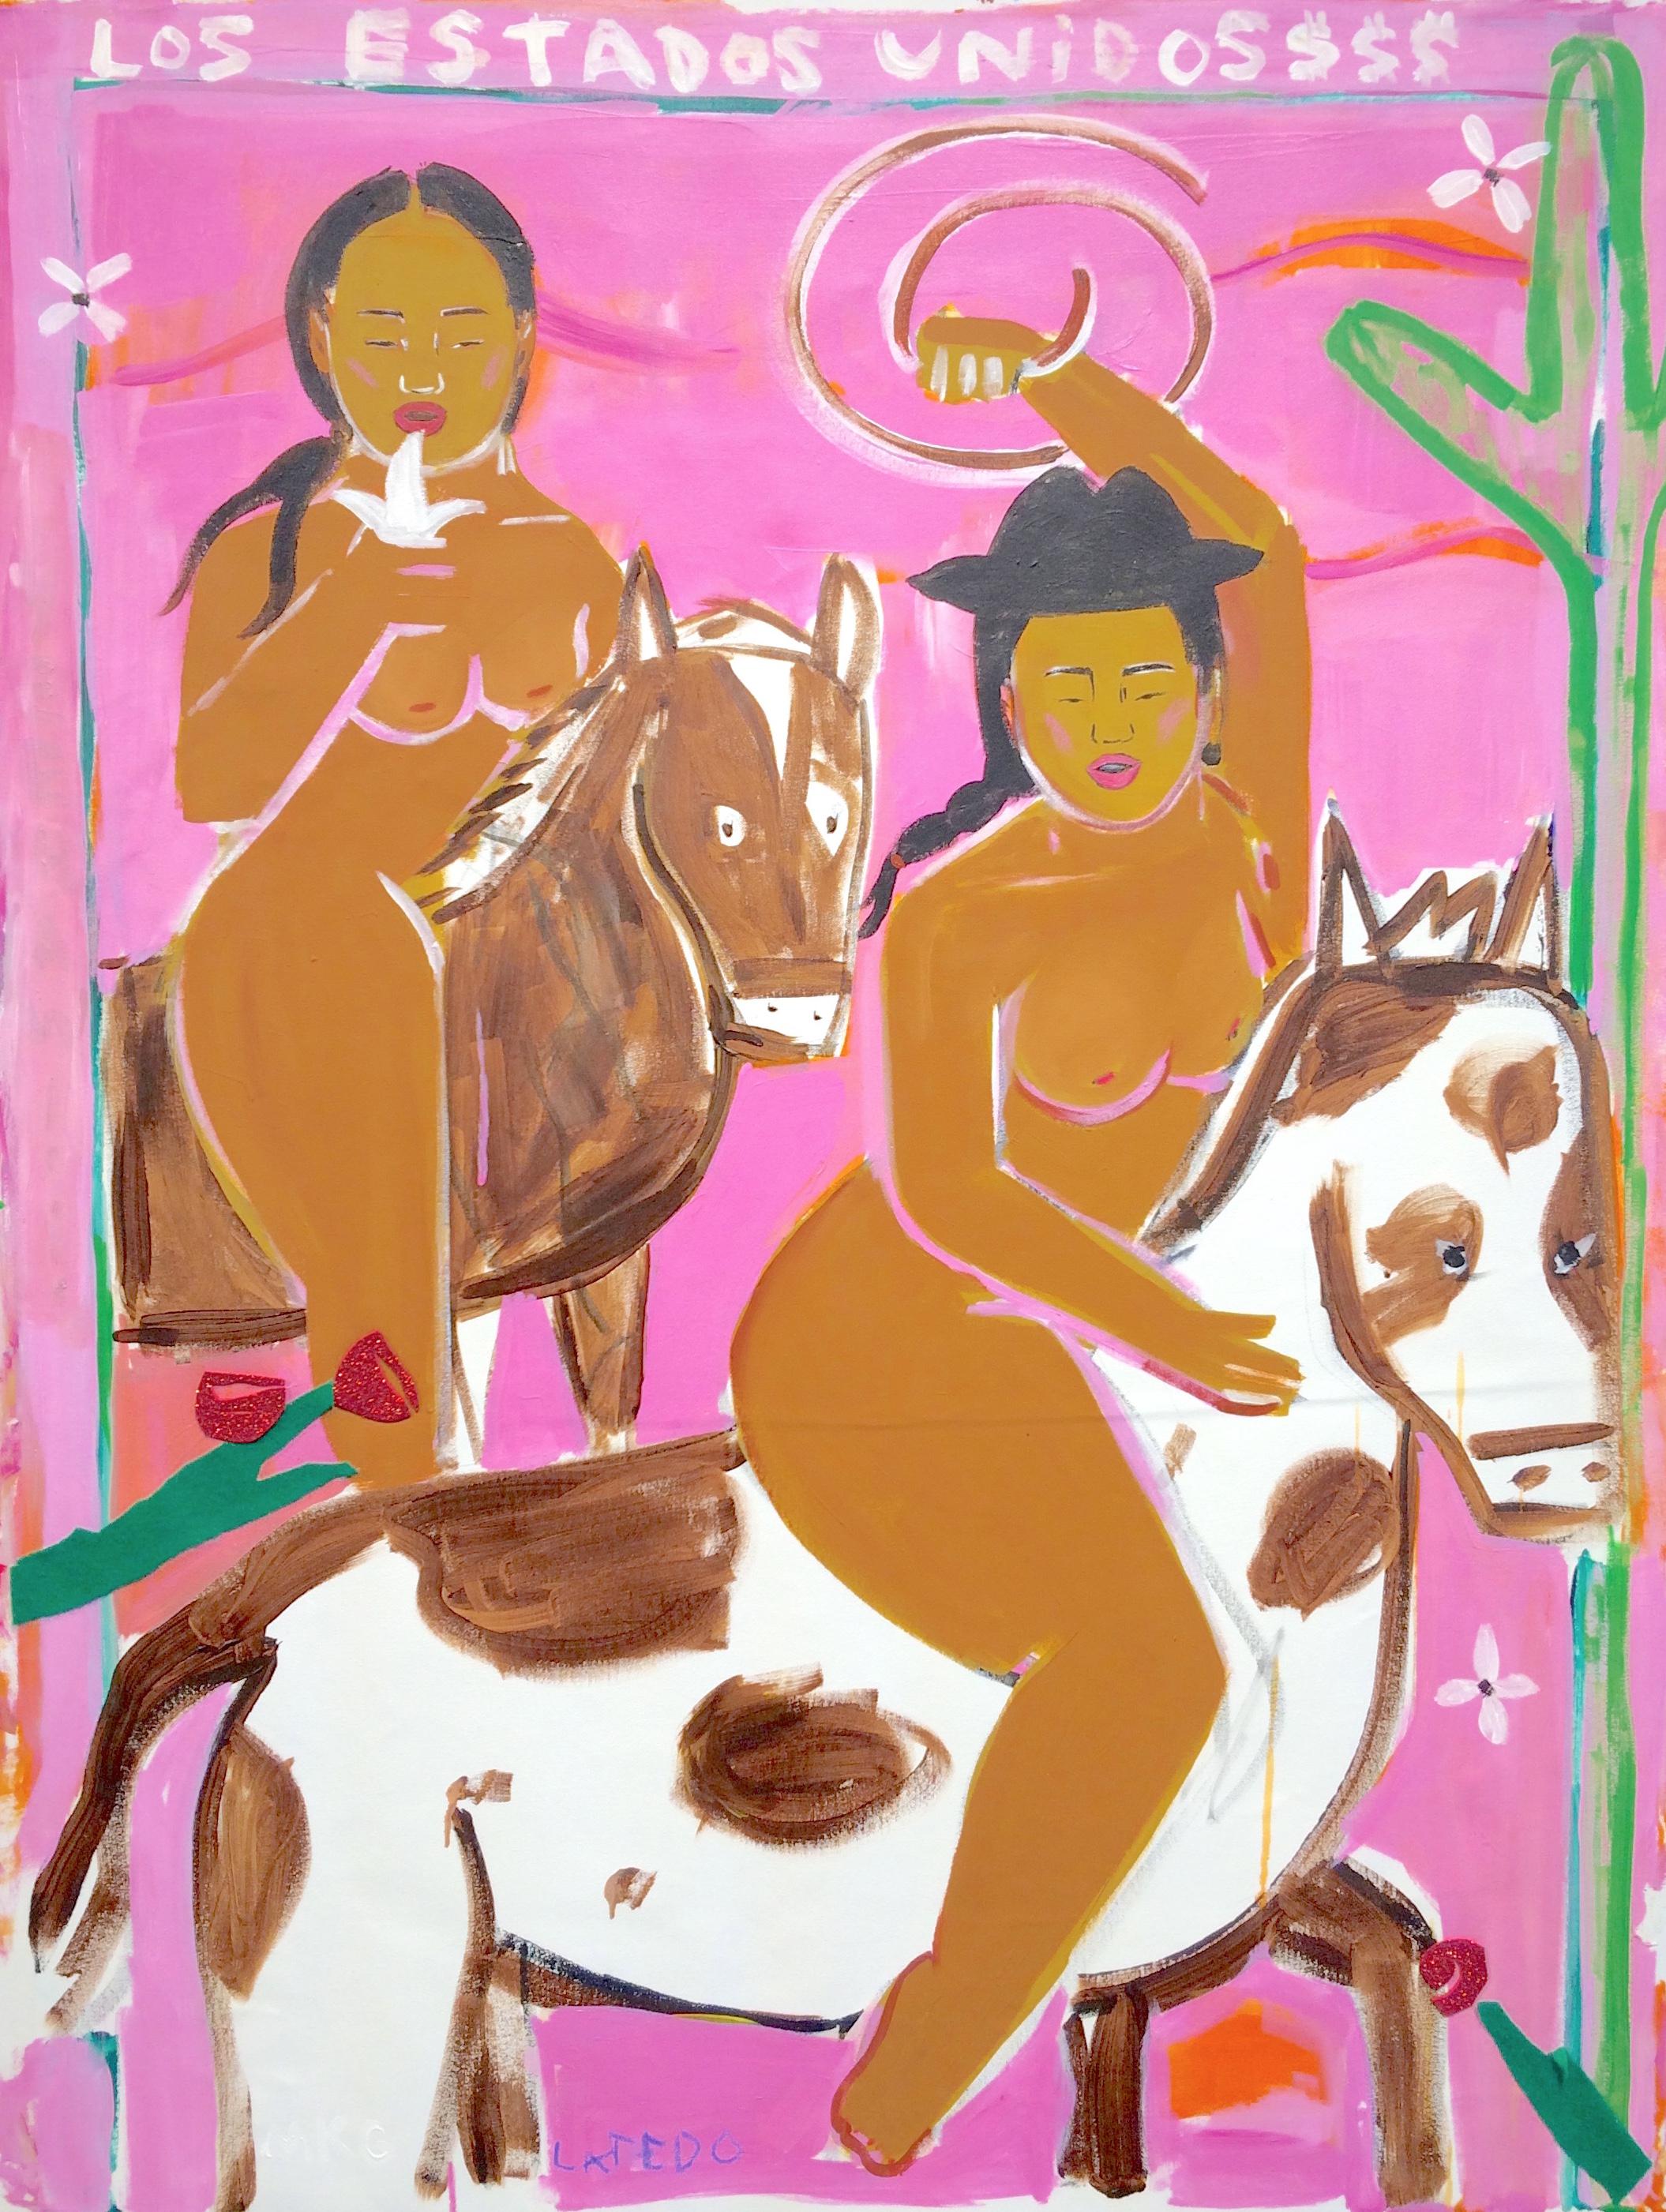 Laredo 1, 2017, acrylic on canvas, 48 x 36 inches